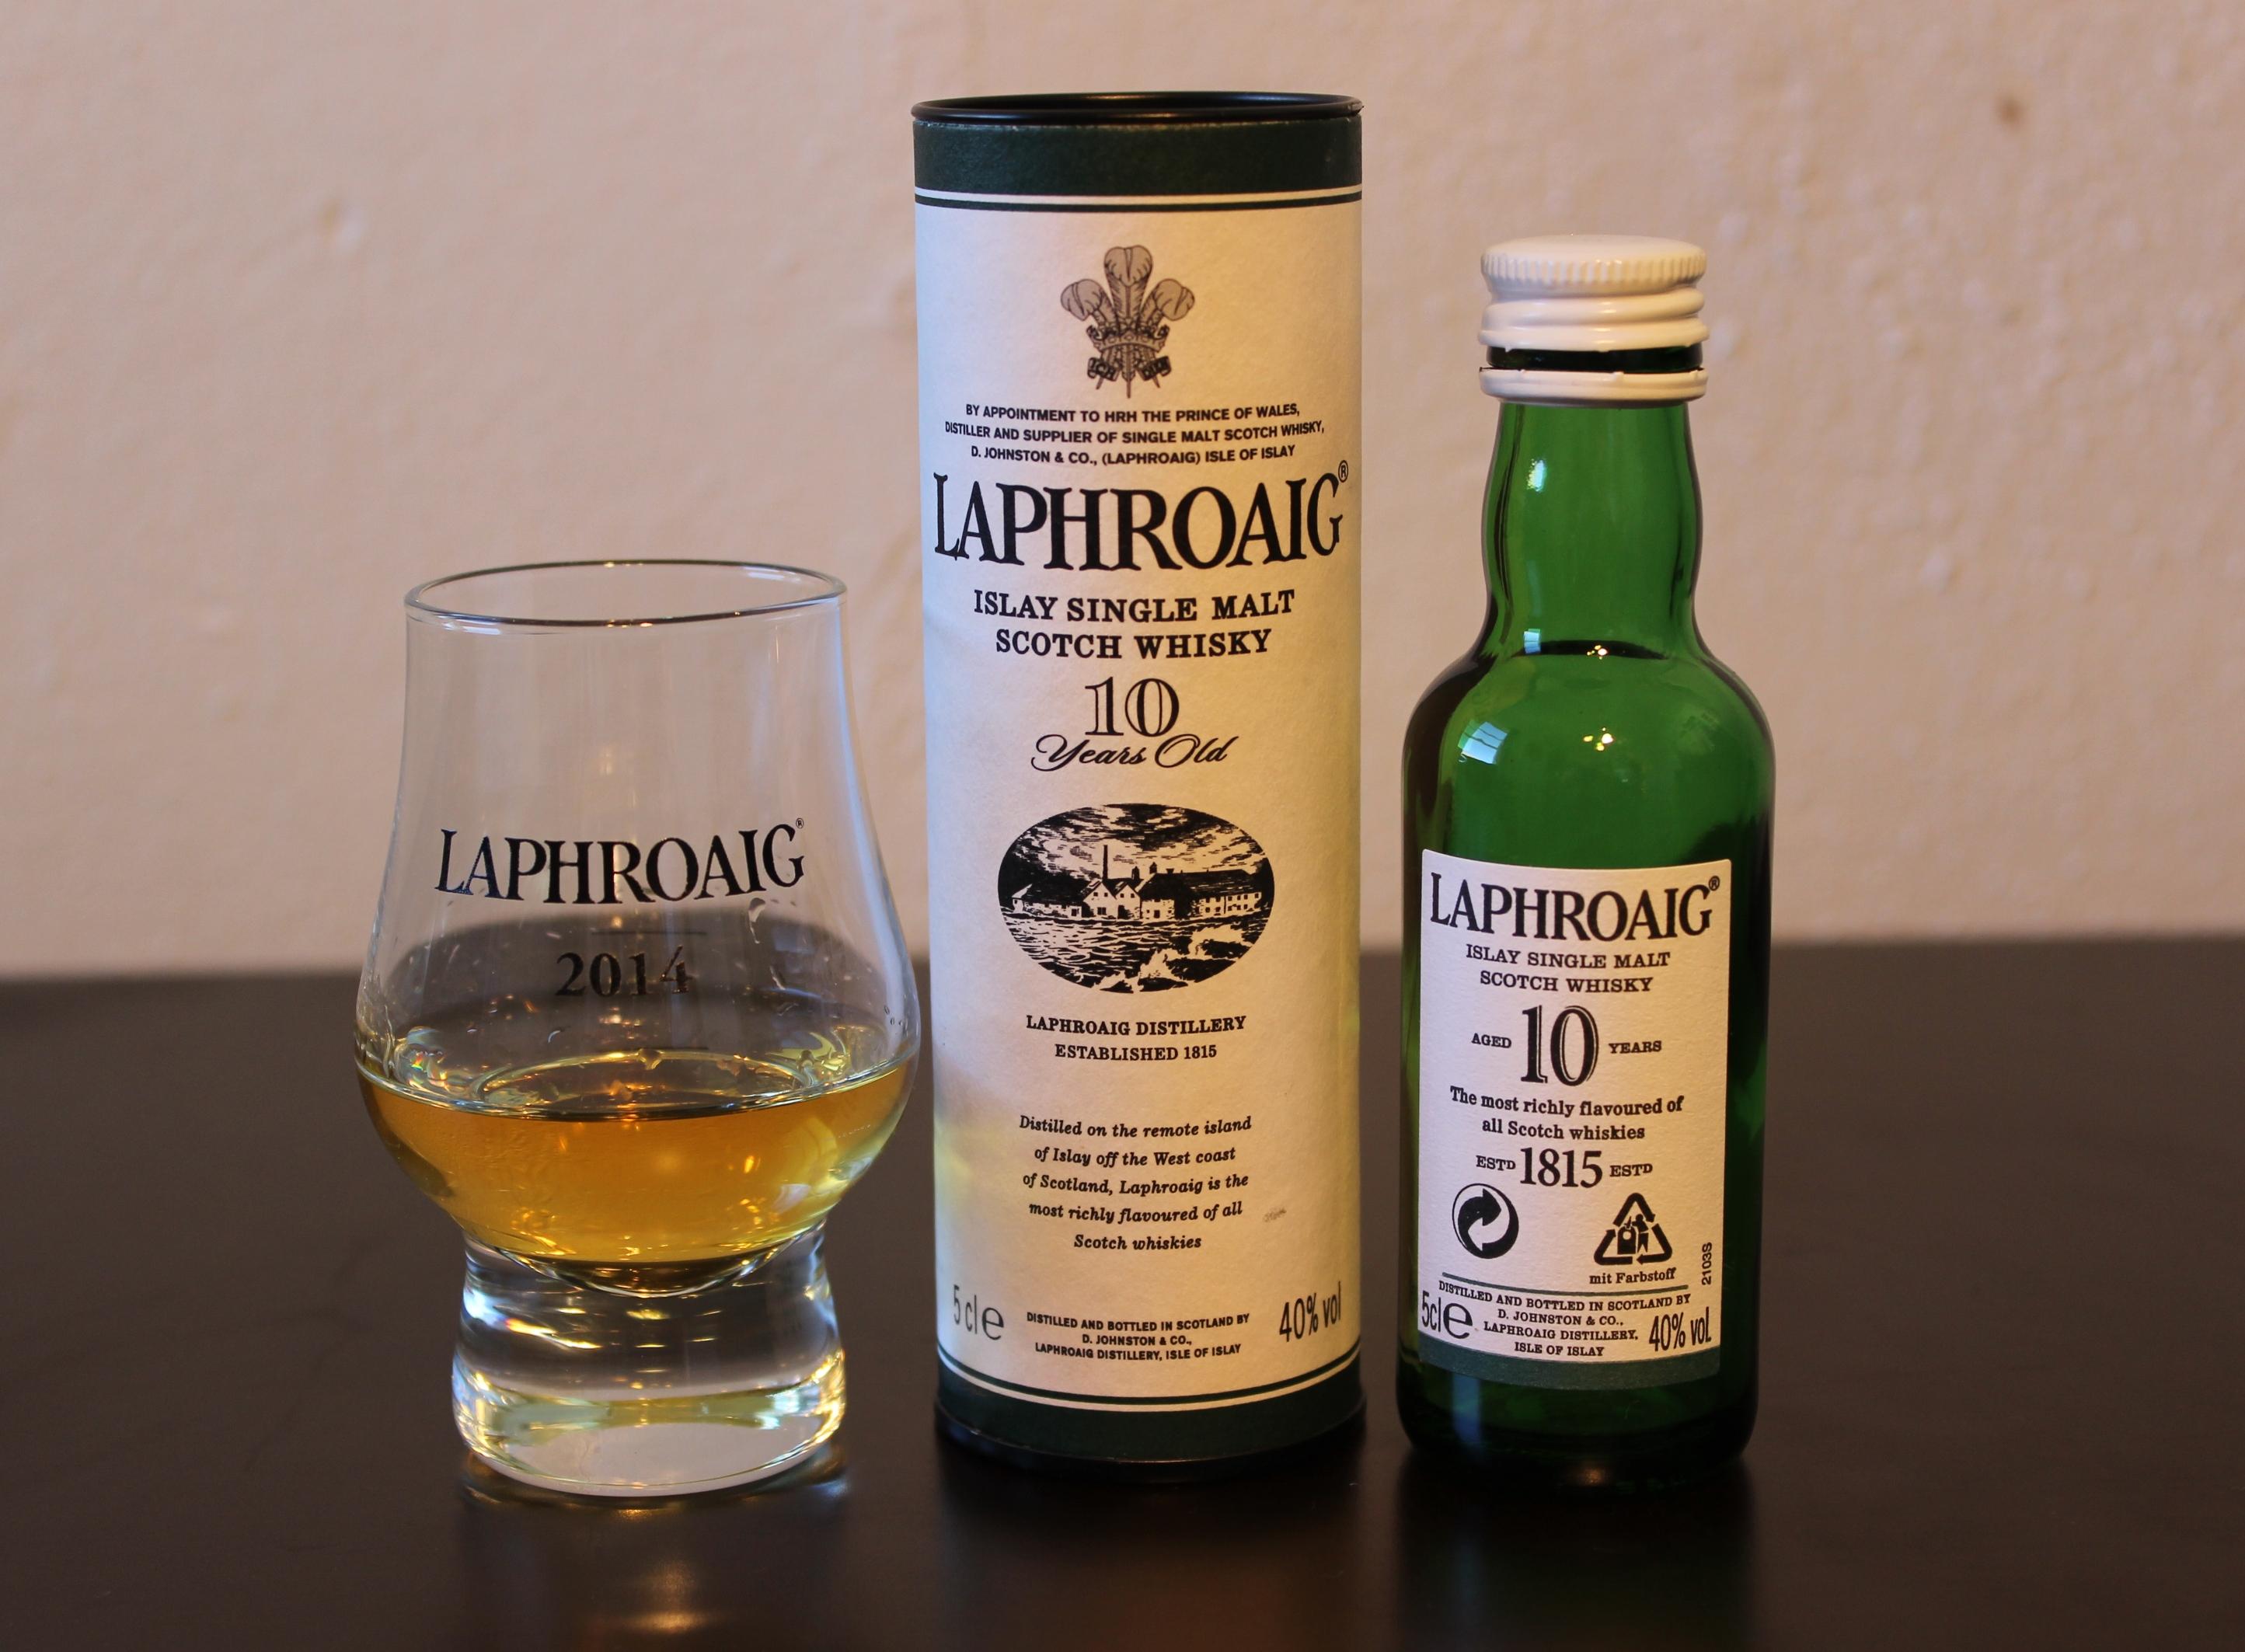 Laphroaig Pics, Products Collection